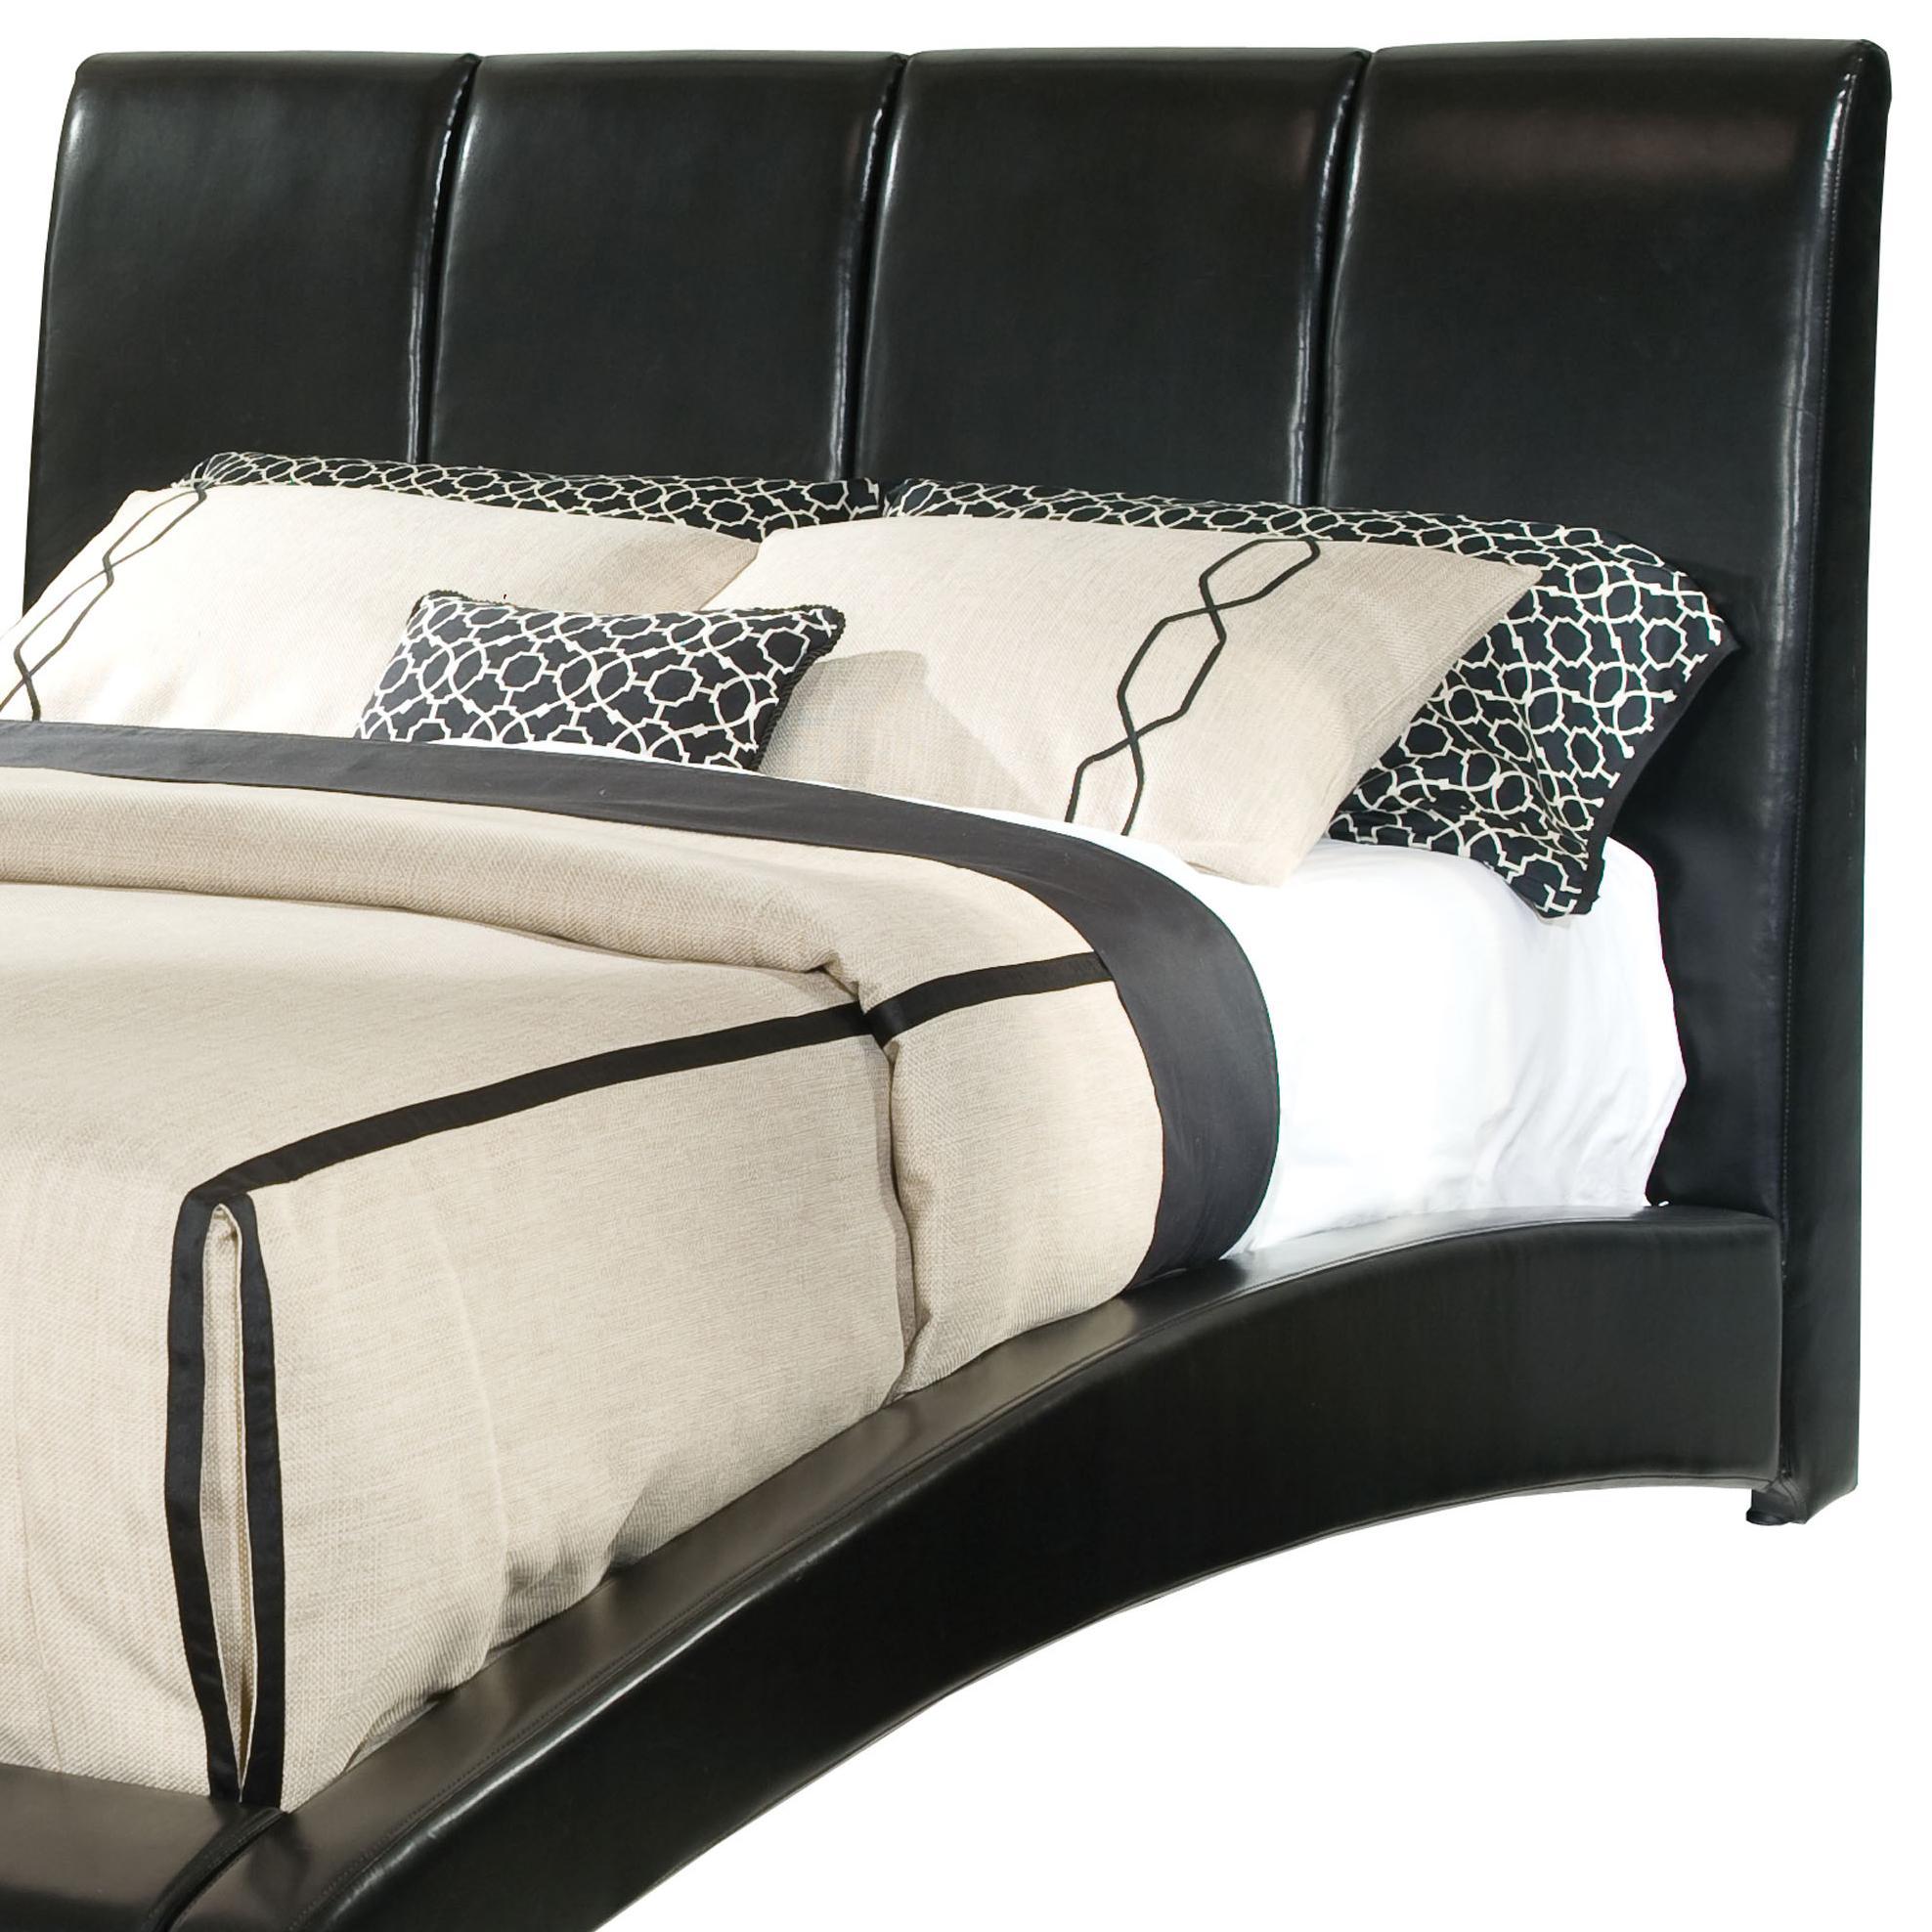 Standard Furniture Moderno Queen Upholstered Headboard - Item Number: 99501